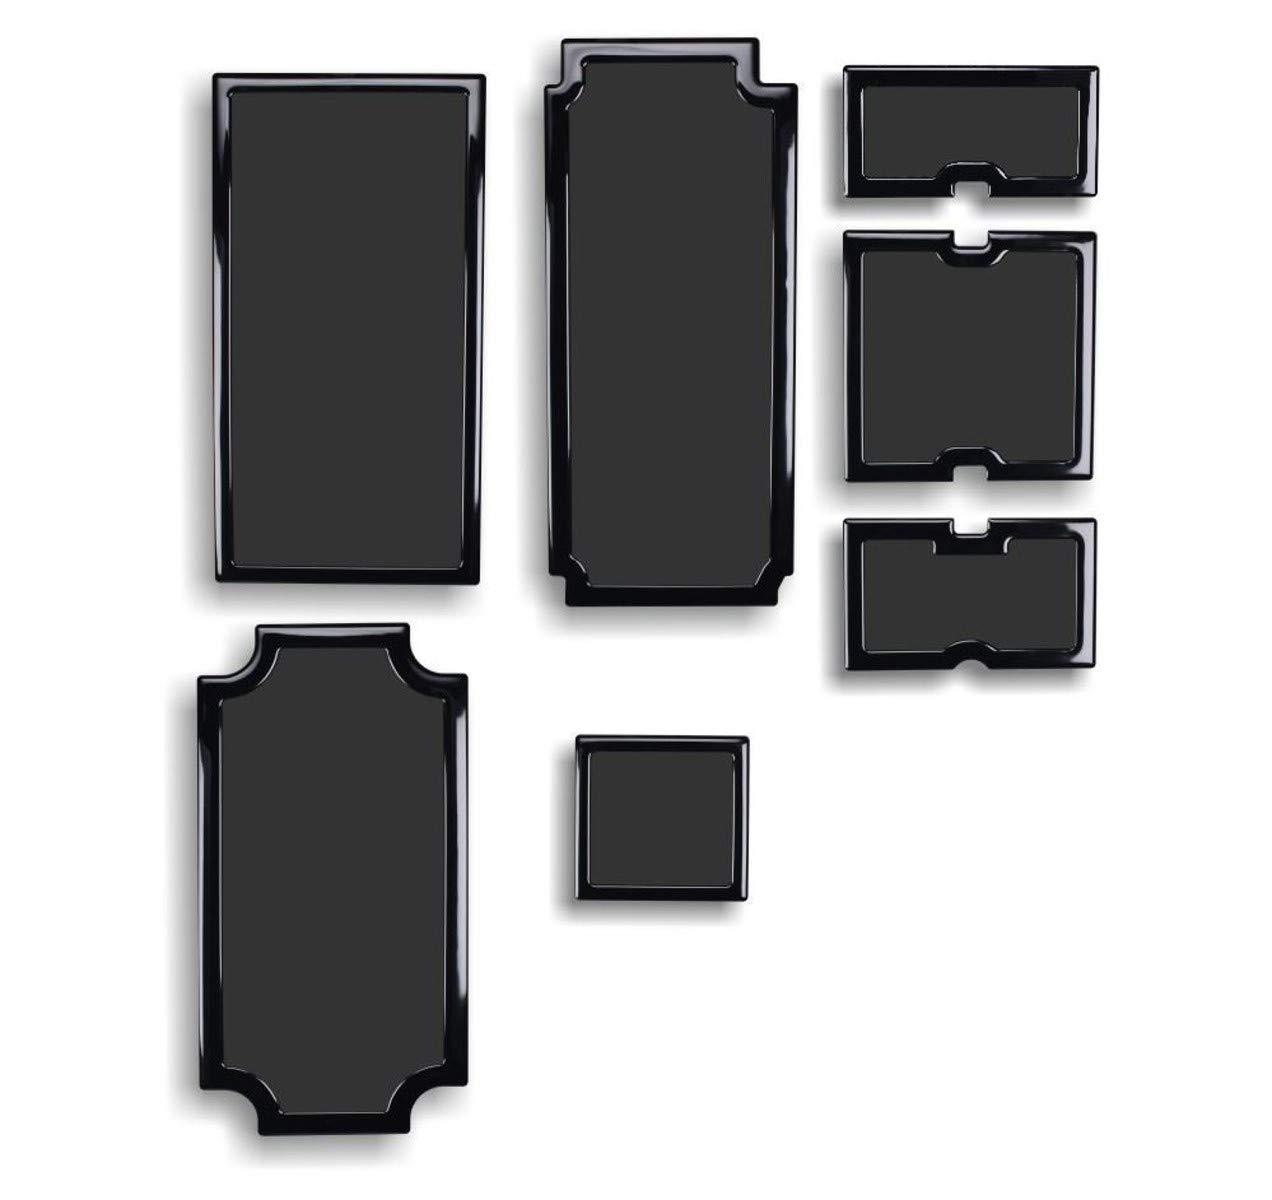 DEMCiflex Dust Filter Kit for Sliger Cerberus X Filter Kit (Case with Handle) by DEMCiflex